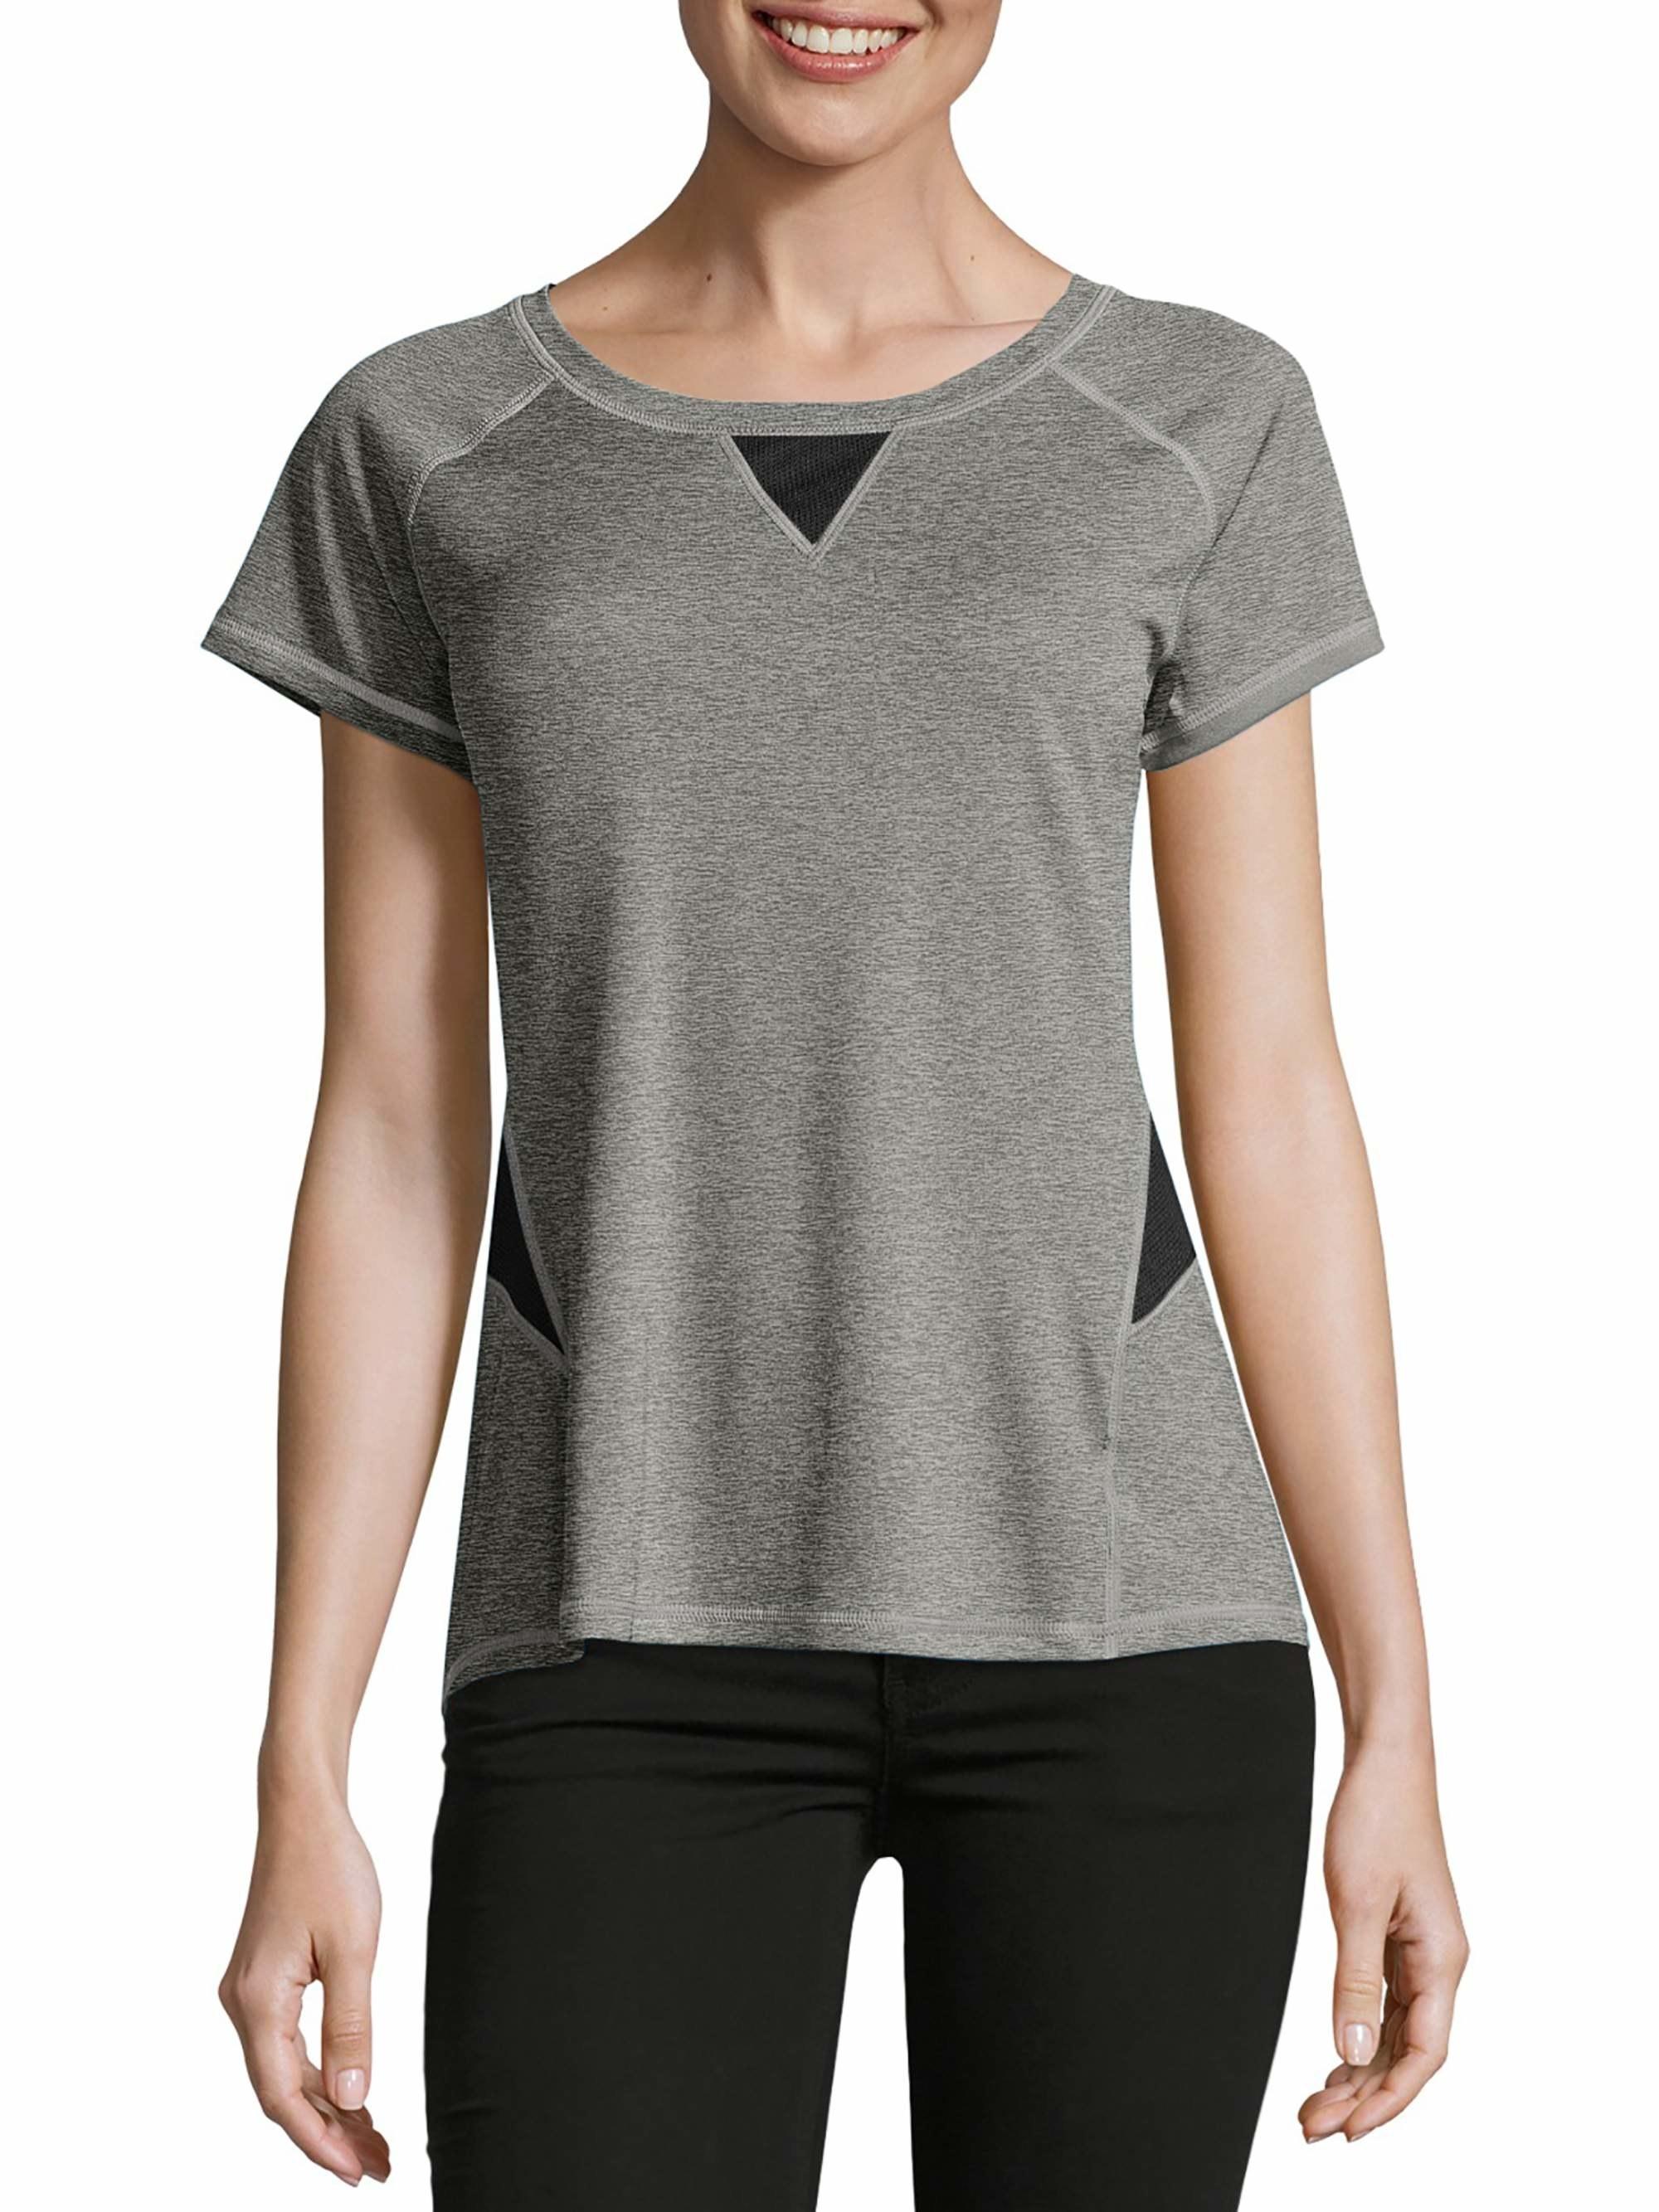 model wearing heather gray T-shirt